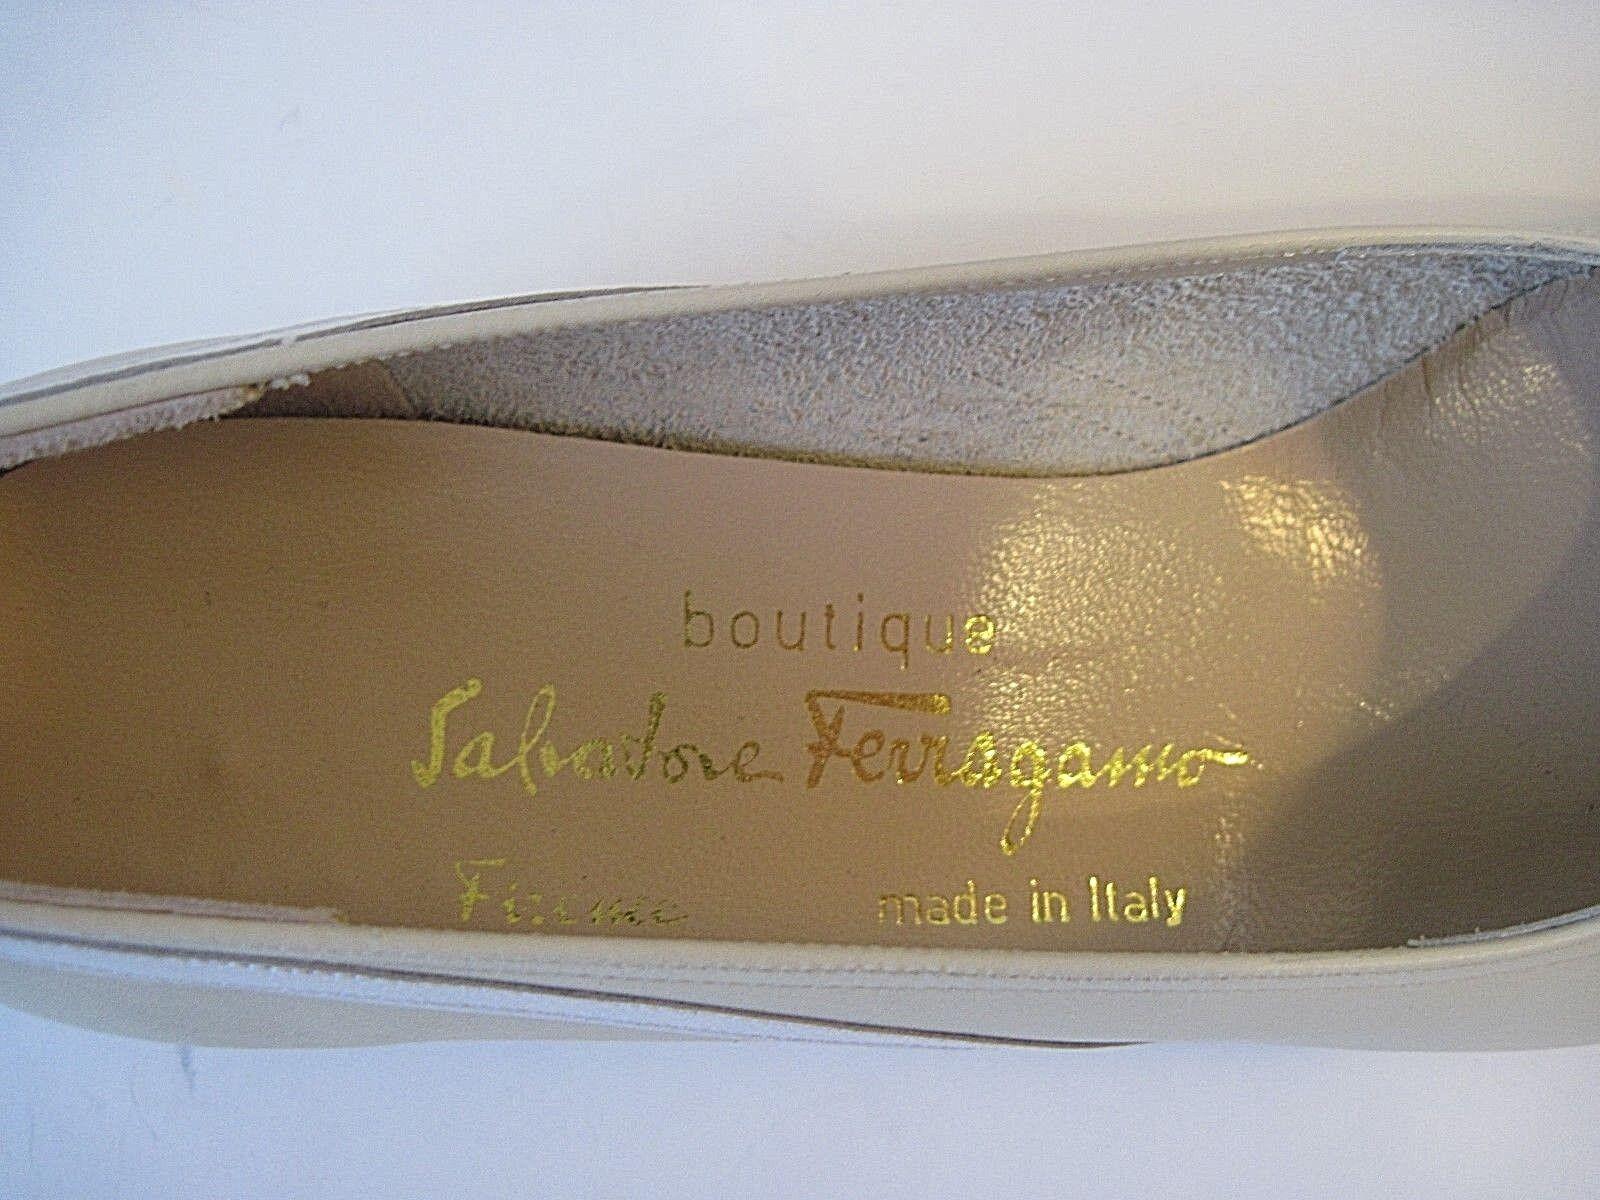 Salvatore Ferragamo Cream Weiß Leder Loafers Größe 6.5 2A, 2A, 2A, Excellent 69f40a